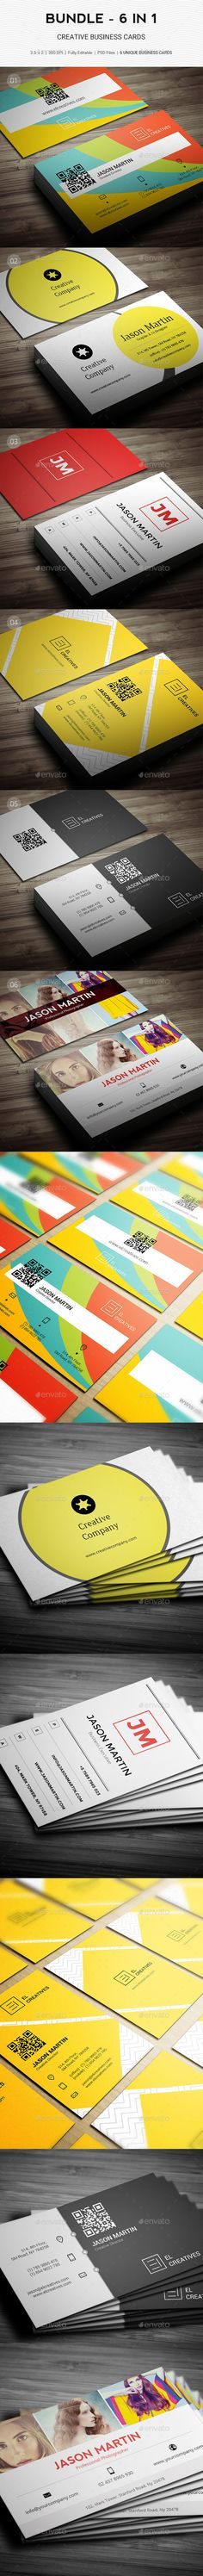 Bundle - 6 in 1 - Pro Creative Business Cards Templates PSD